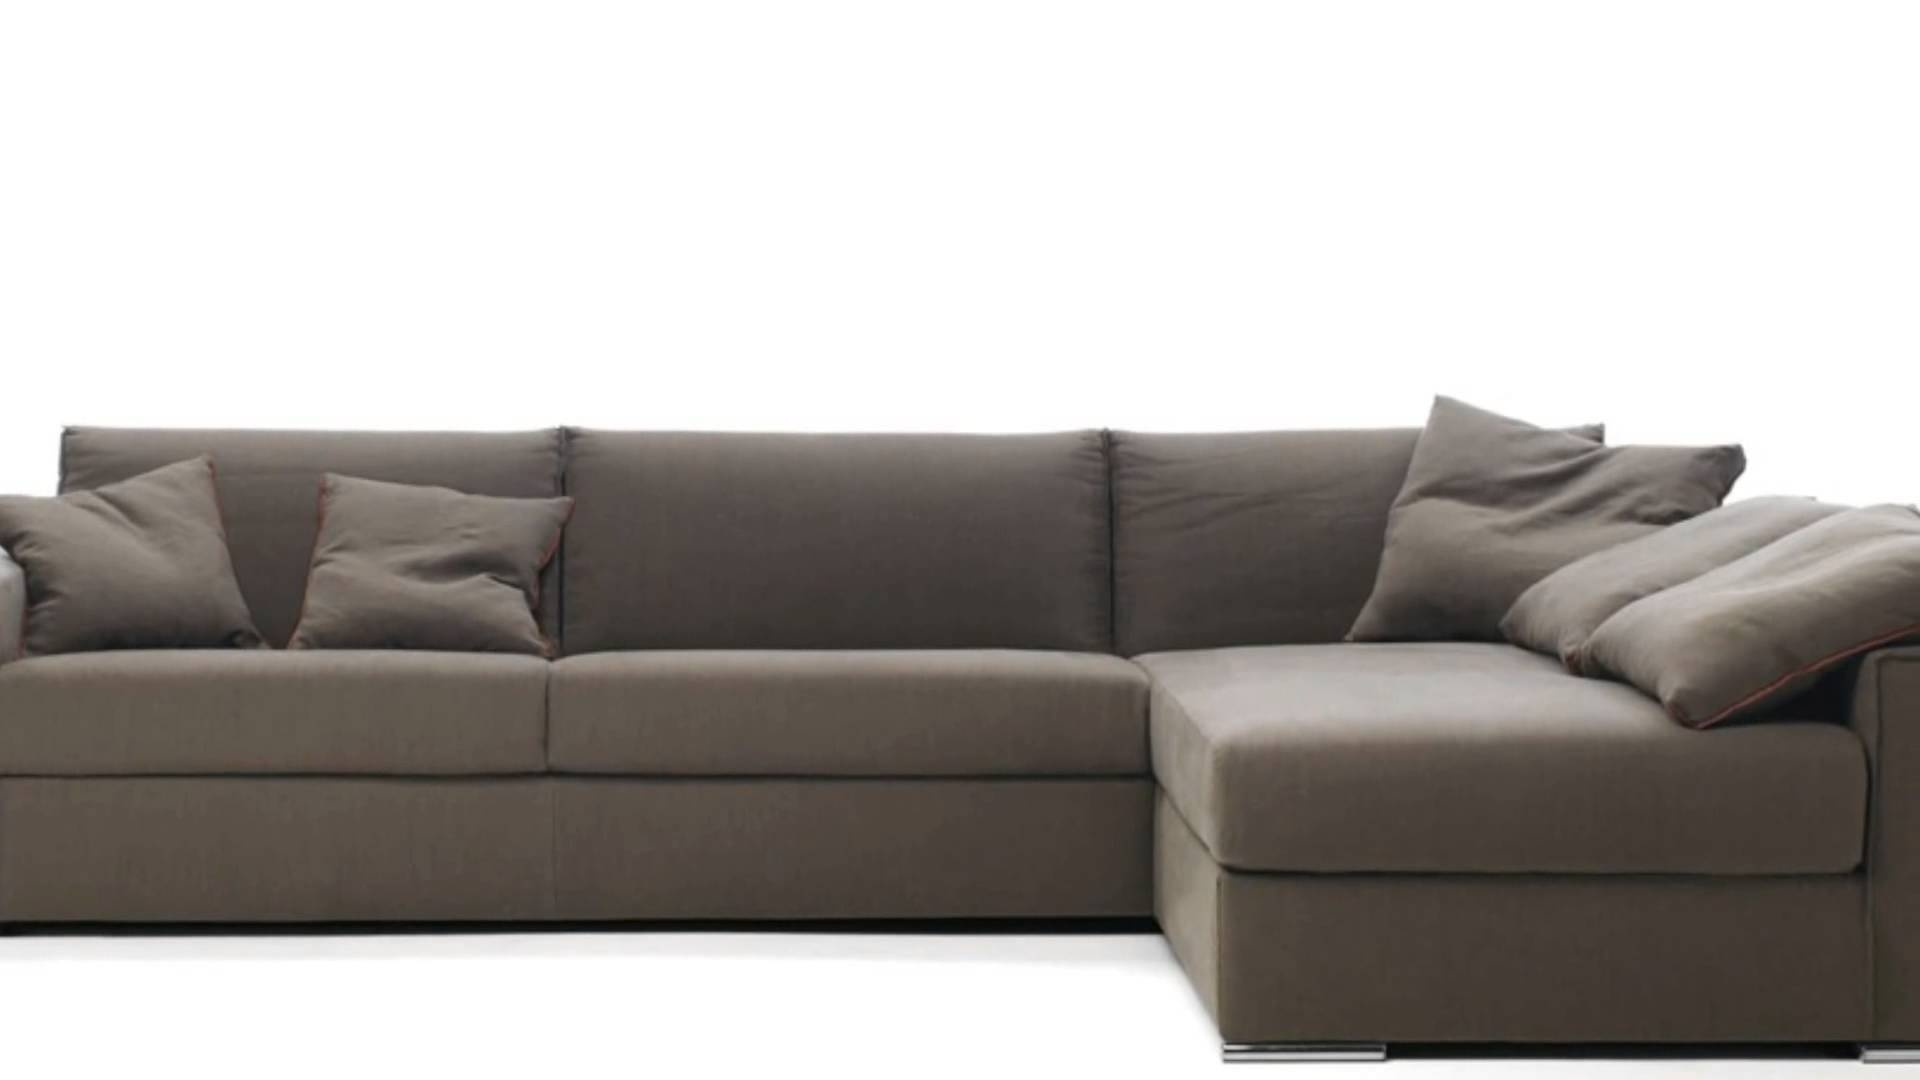 Sofas Center : Impressive Modern Sofa Beds Photo Design Santafe regarding Long Modern Sofas (Image 26 of 30)